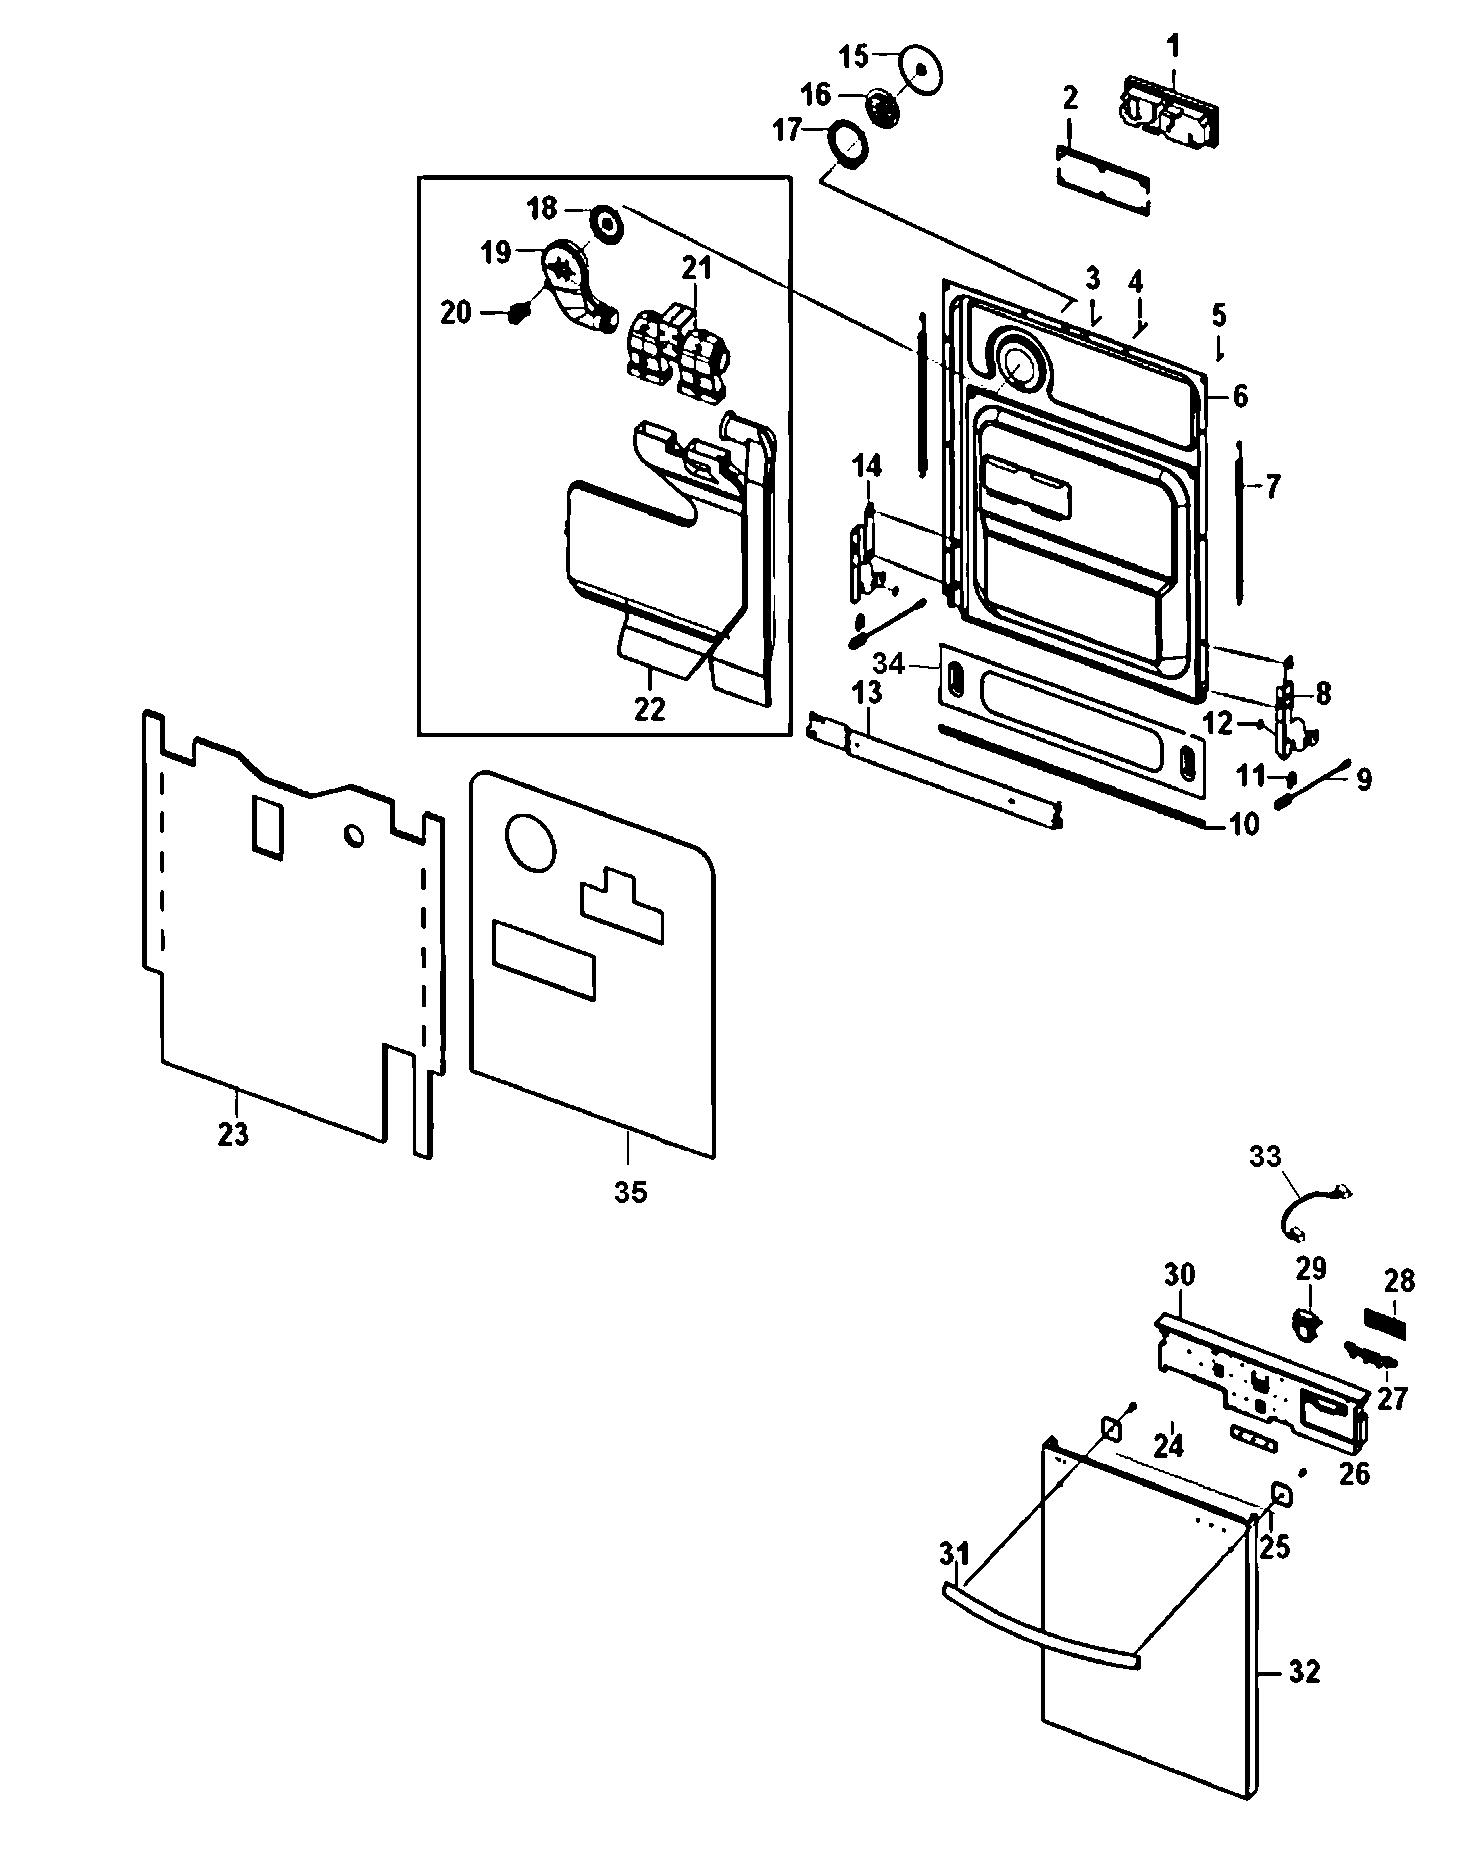 Samsung model DMT400RHS/XAA dishwasher genuine parts